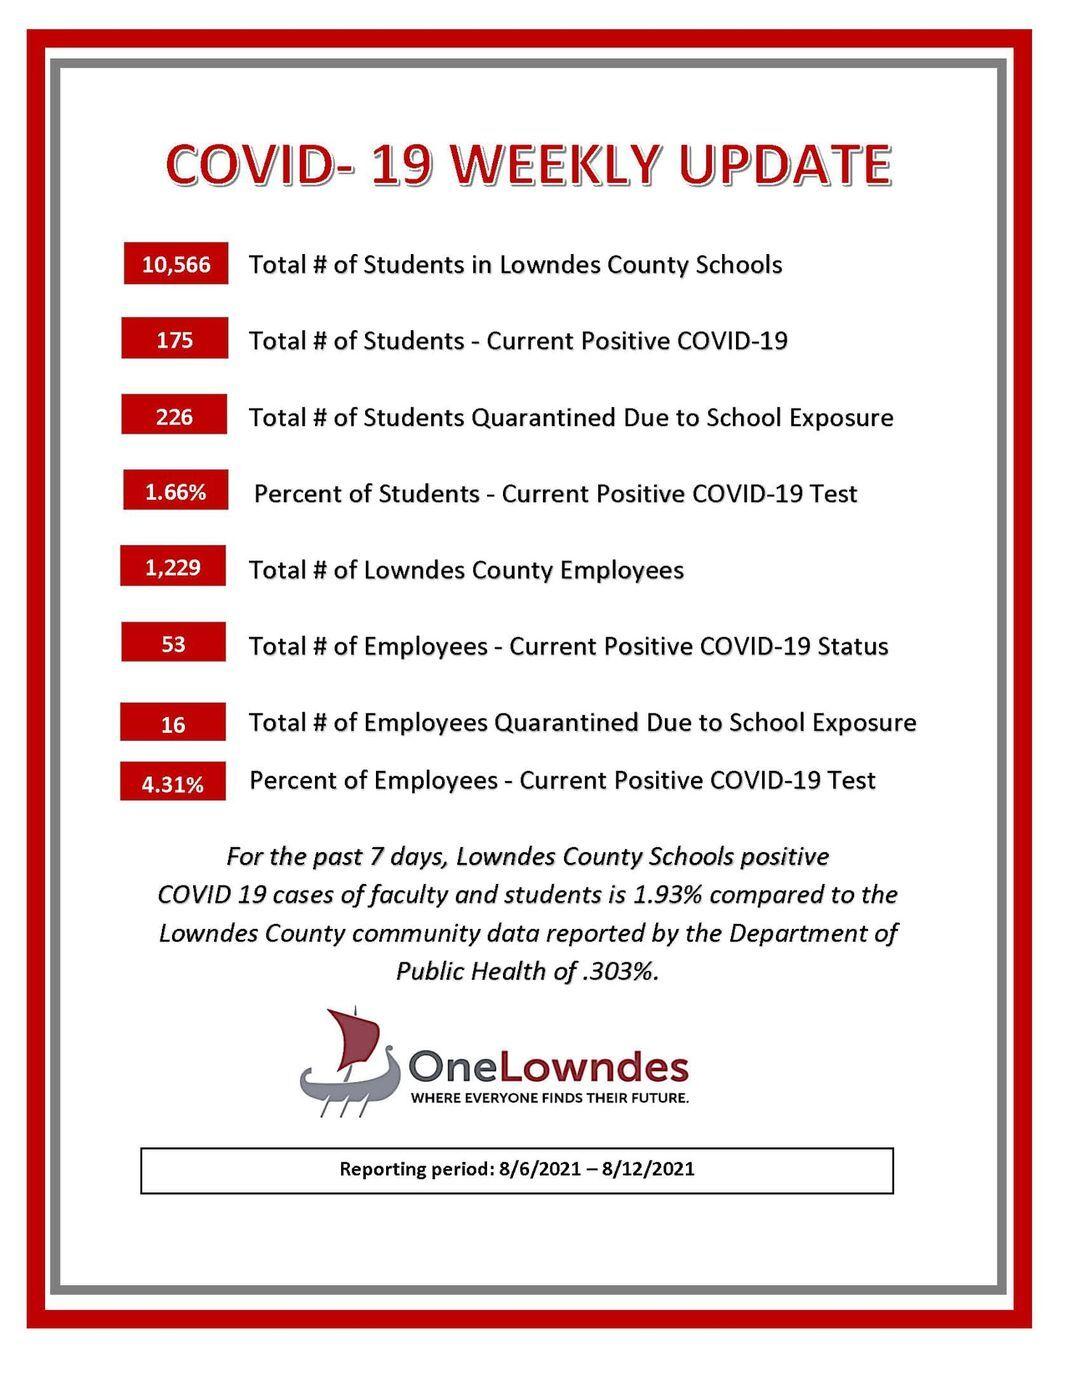 Lowndes County Schools